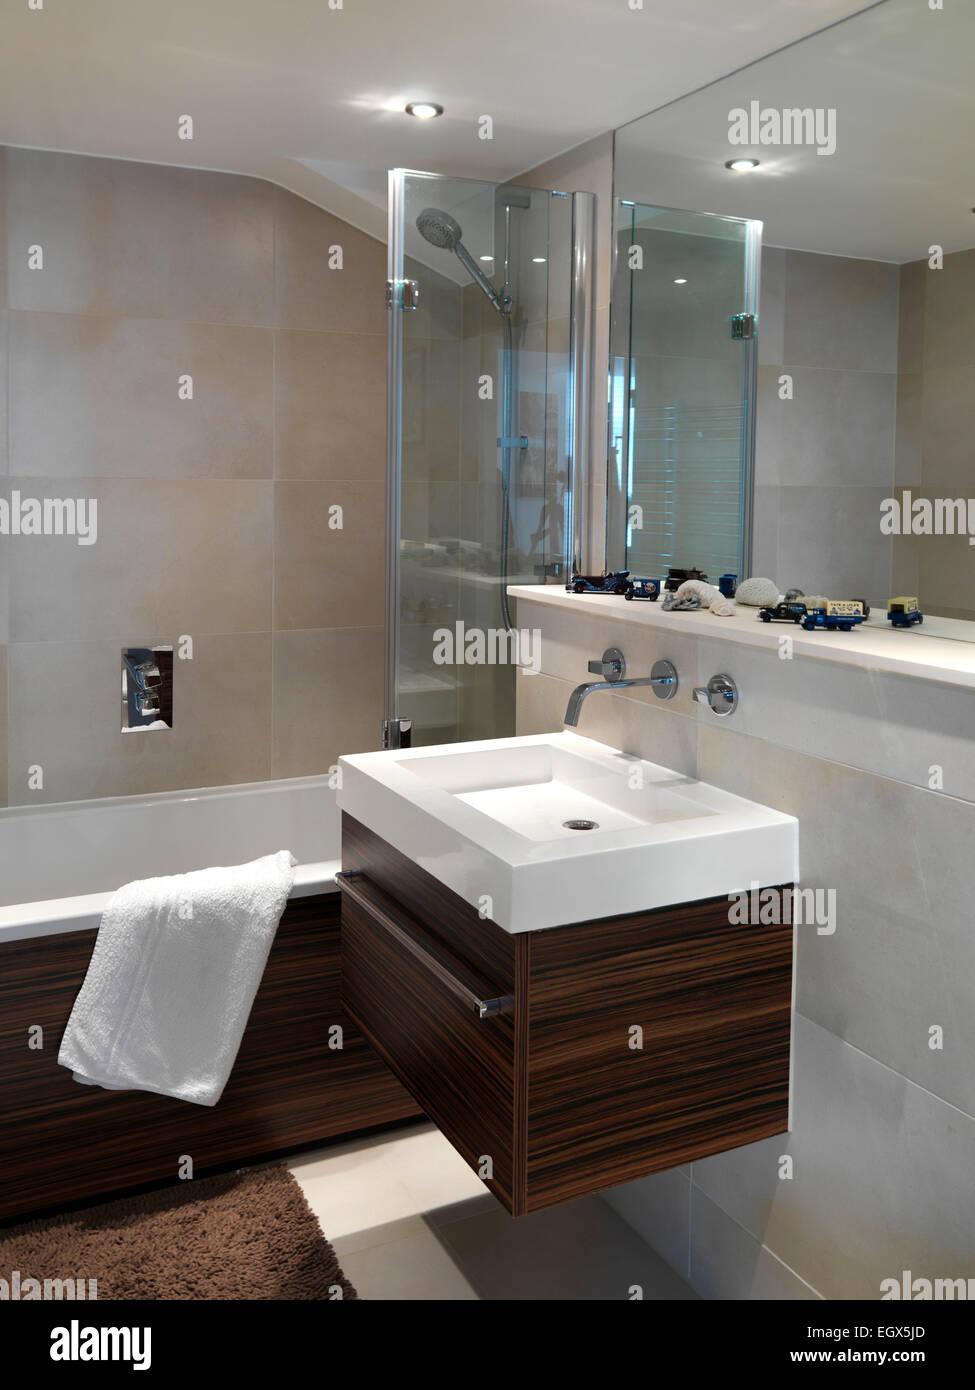 Bathroom Uk Mirror Above Wall Mounted Washbasin In Bathroom Uk Home Stock